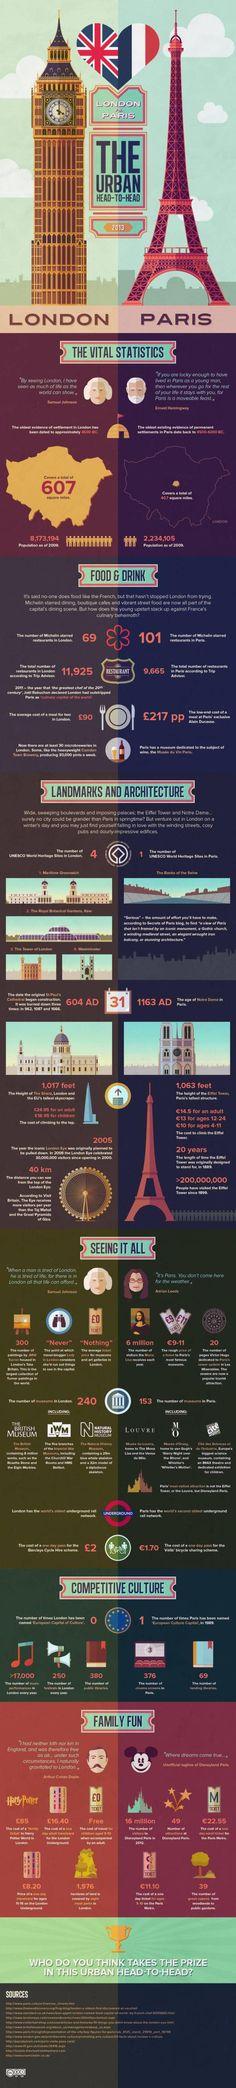 infographic- London vs. Paris: An Infographic Love the colors